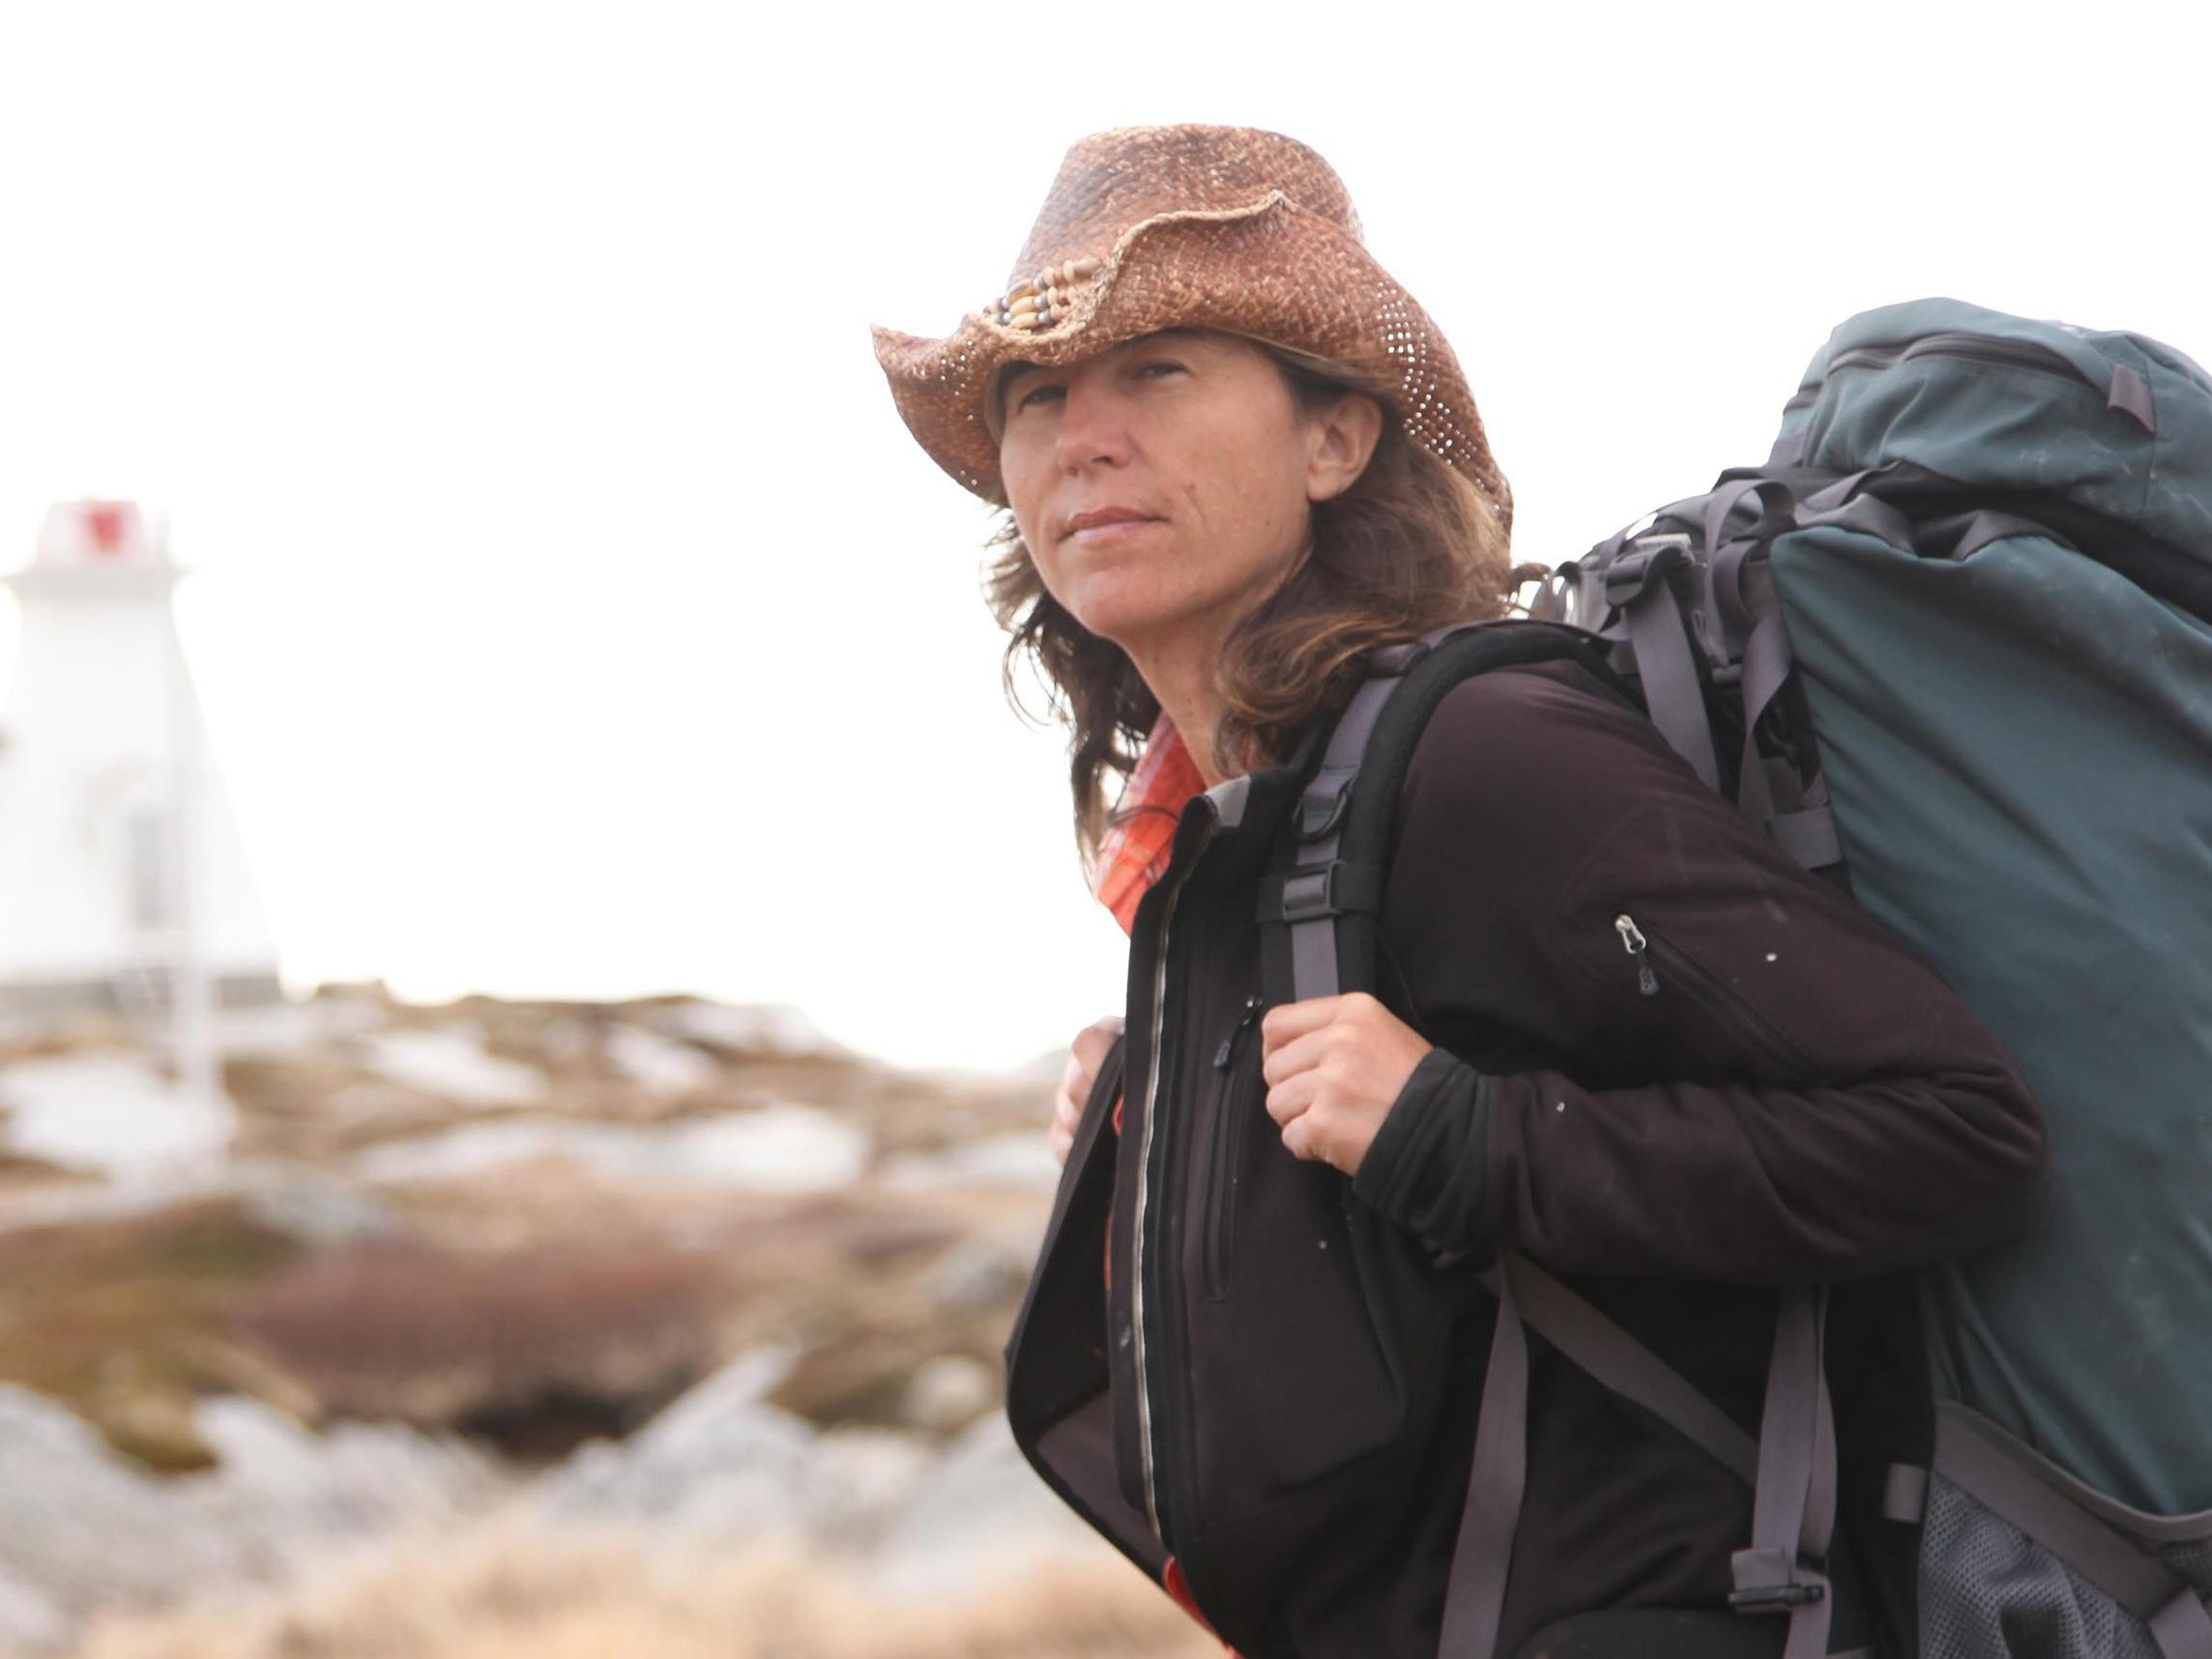 British Columbian filmmaker Dianne Whelan